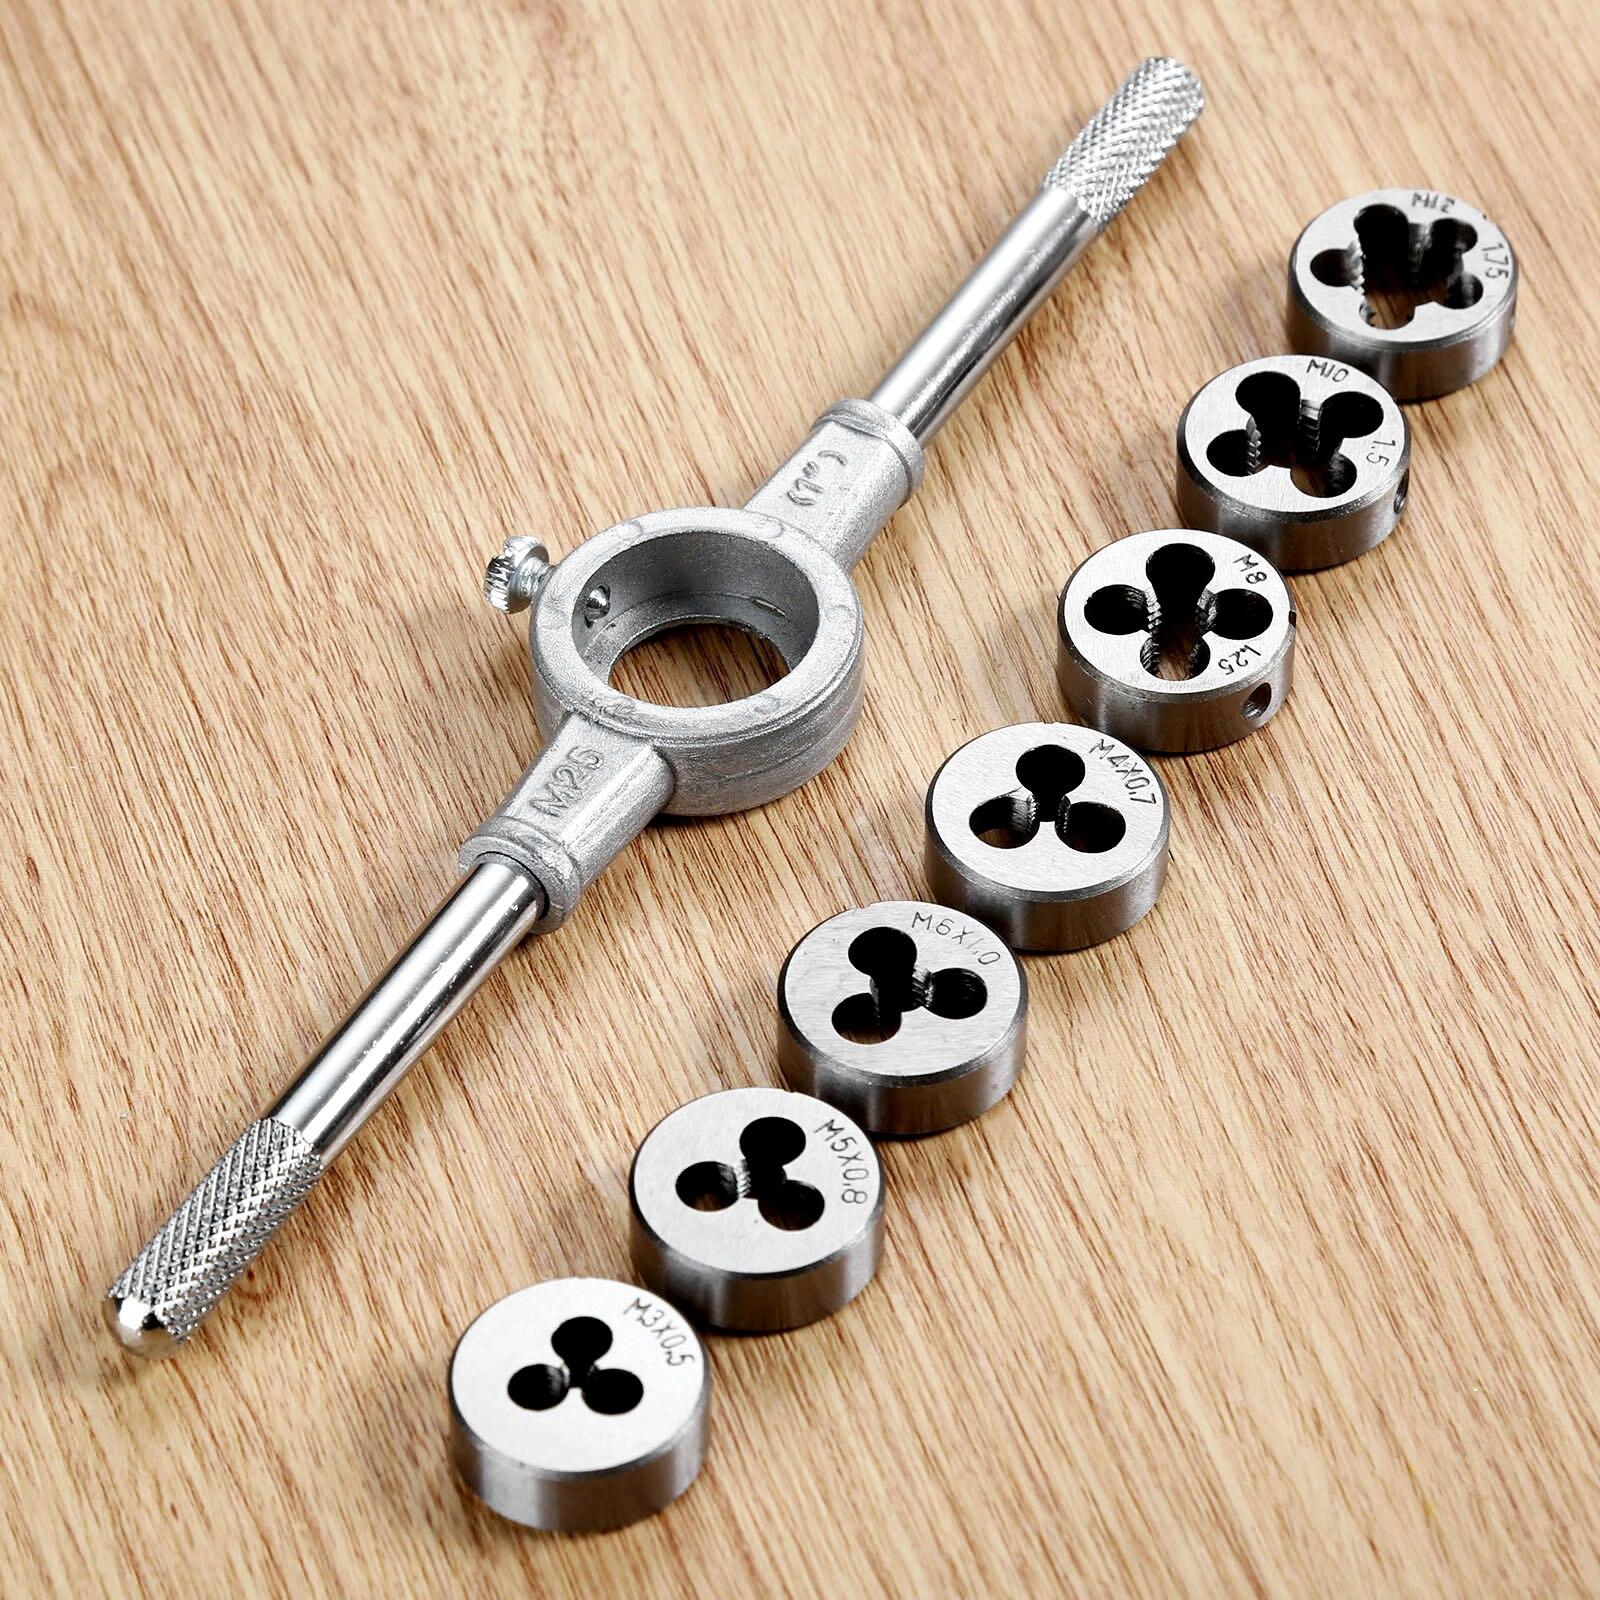 DRELD 8Pcs/set Die Wrench Kit HSS Metric Screw Die M3/M4/M5/M6/M8/M10/M12 Circular Threading Die Hand Tools Kit with Wrench